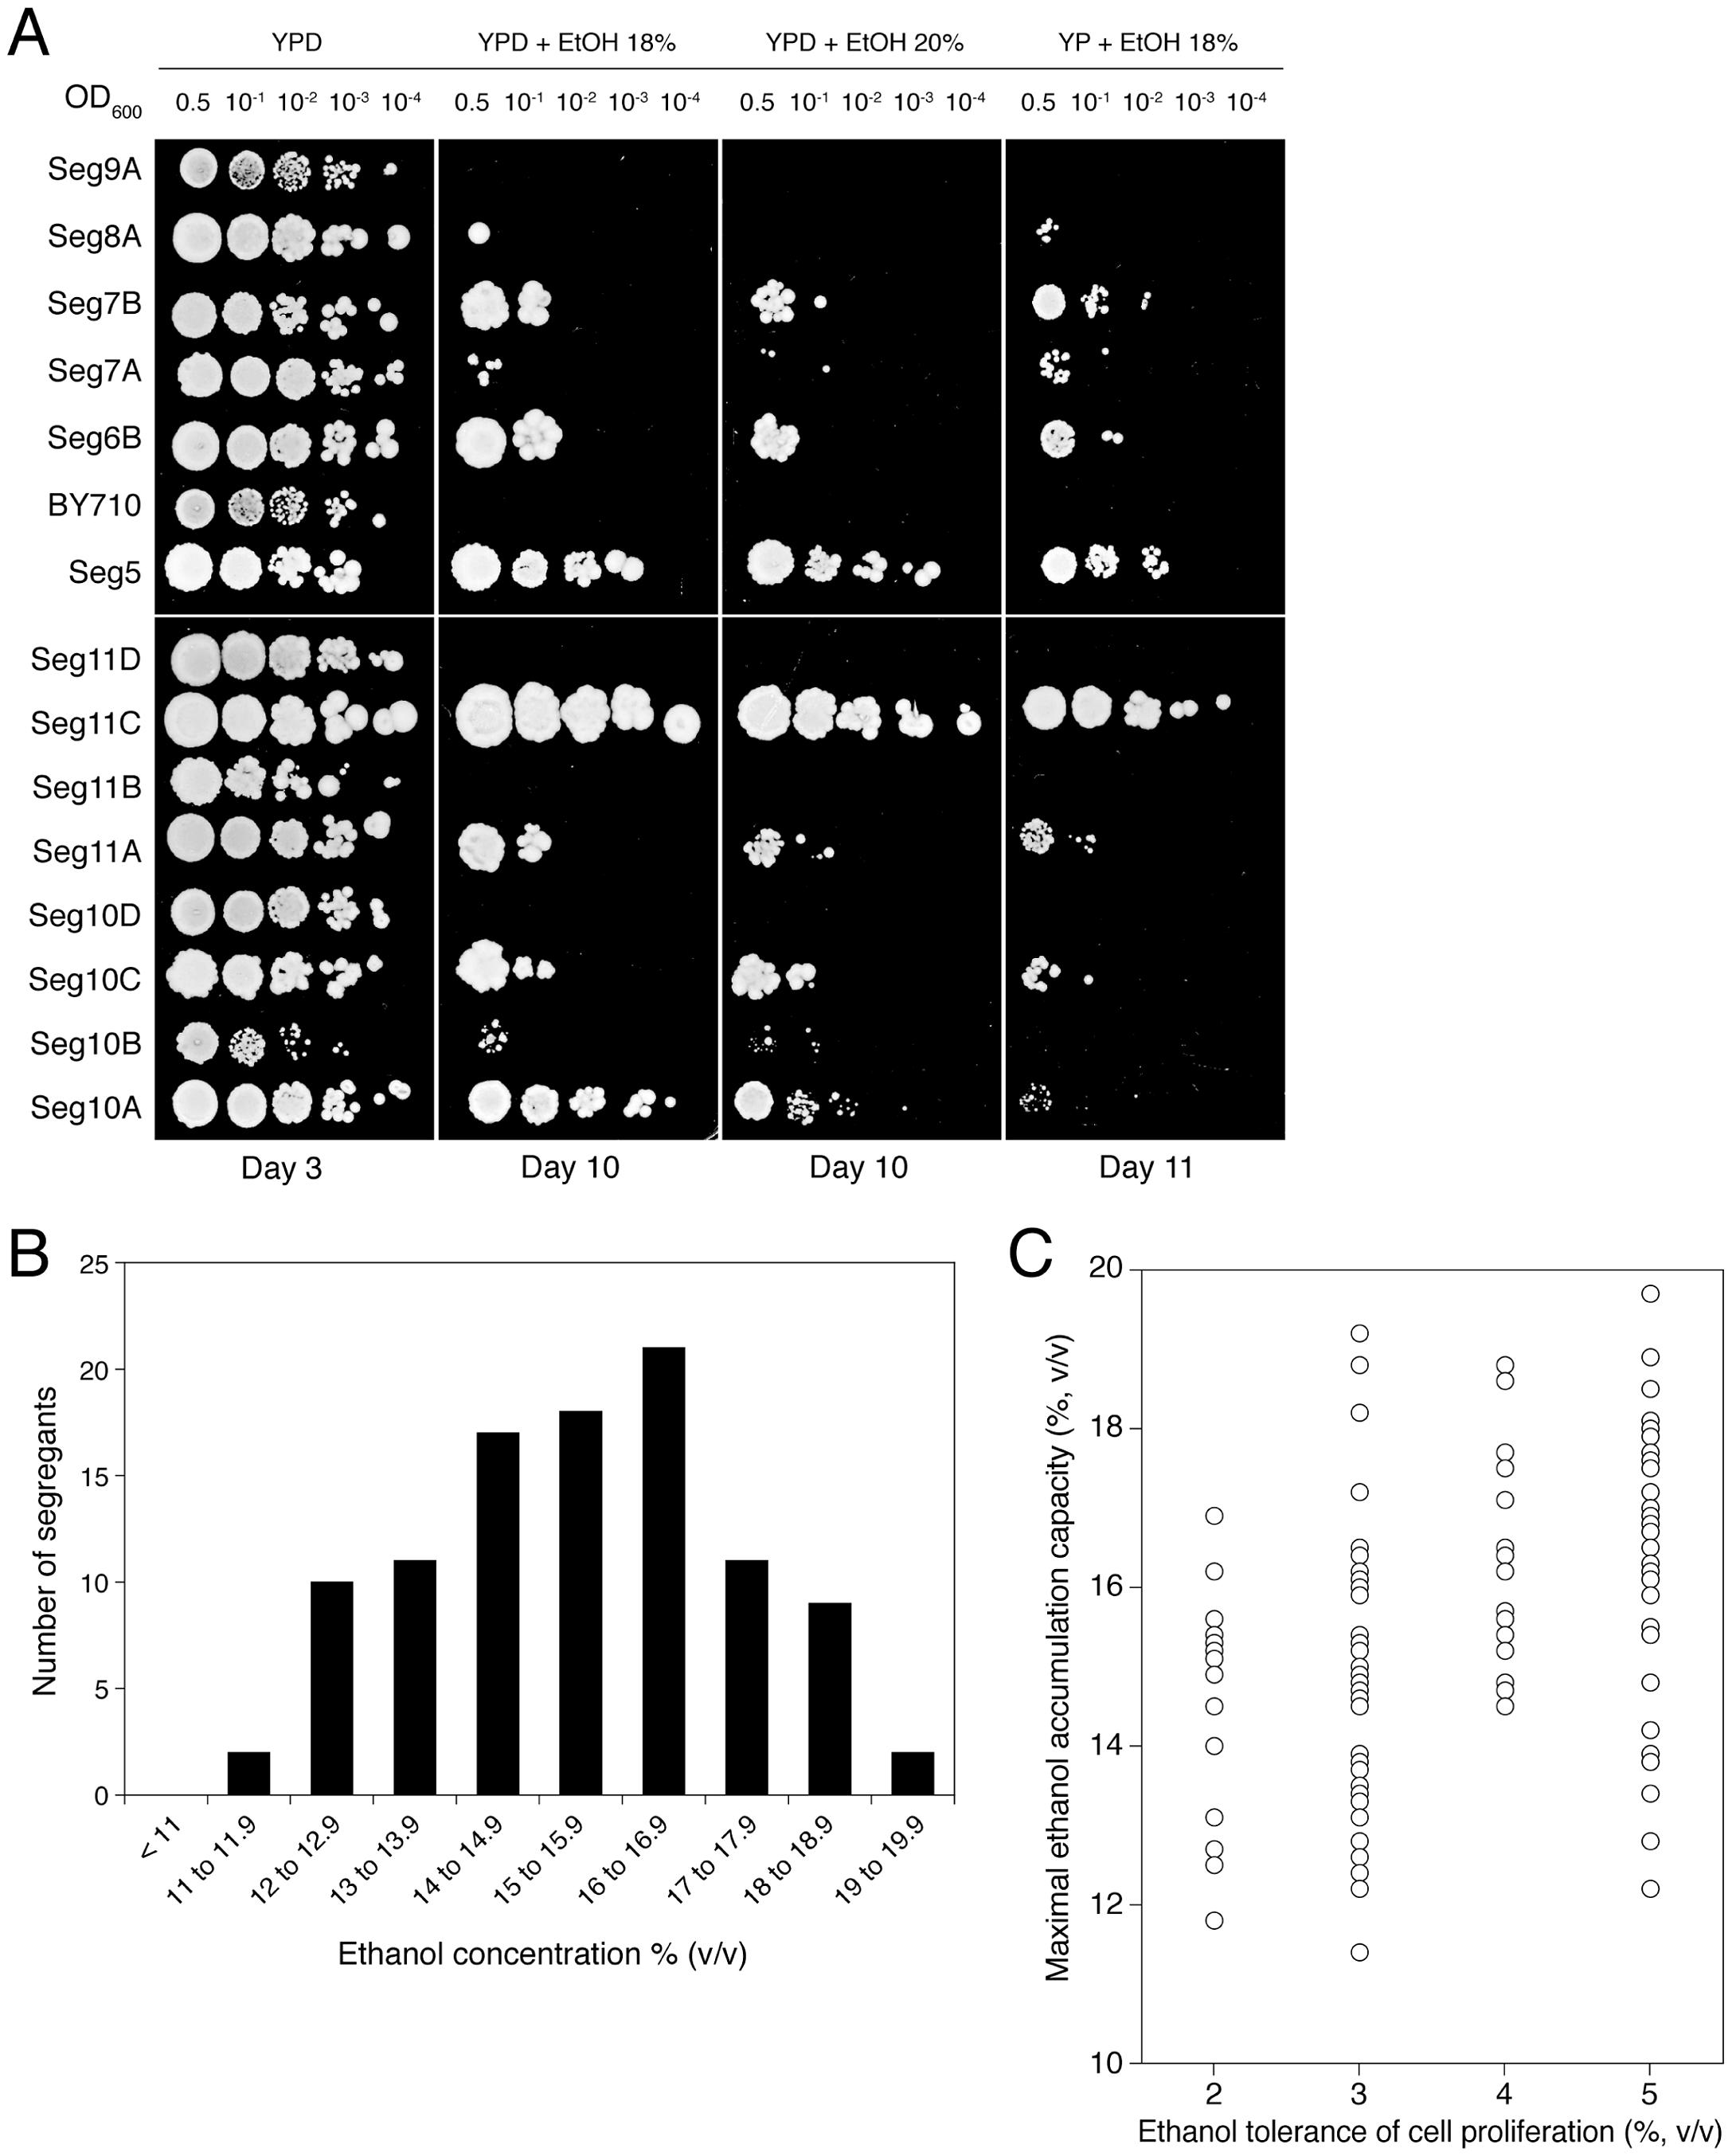 Maximal ethanol accumulation capacity and ethanol tolerance of cell proliferation in meiotic segregants.